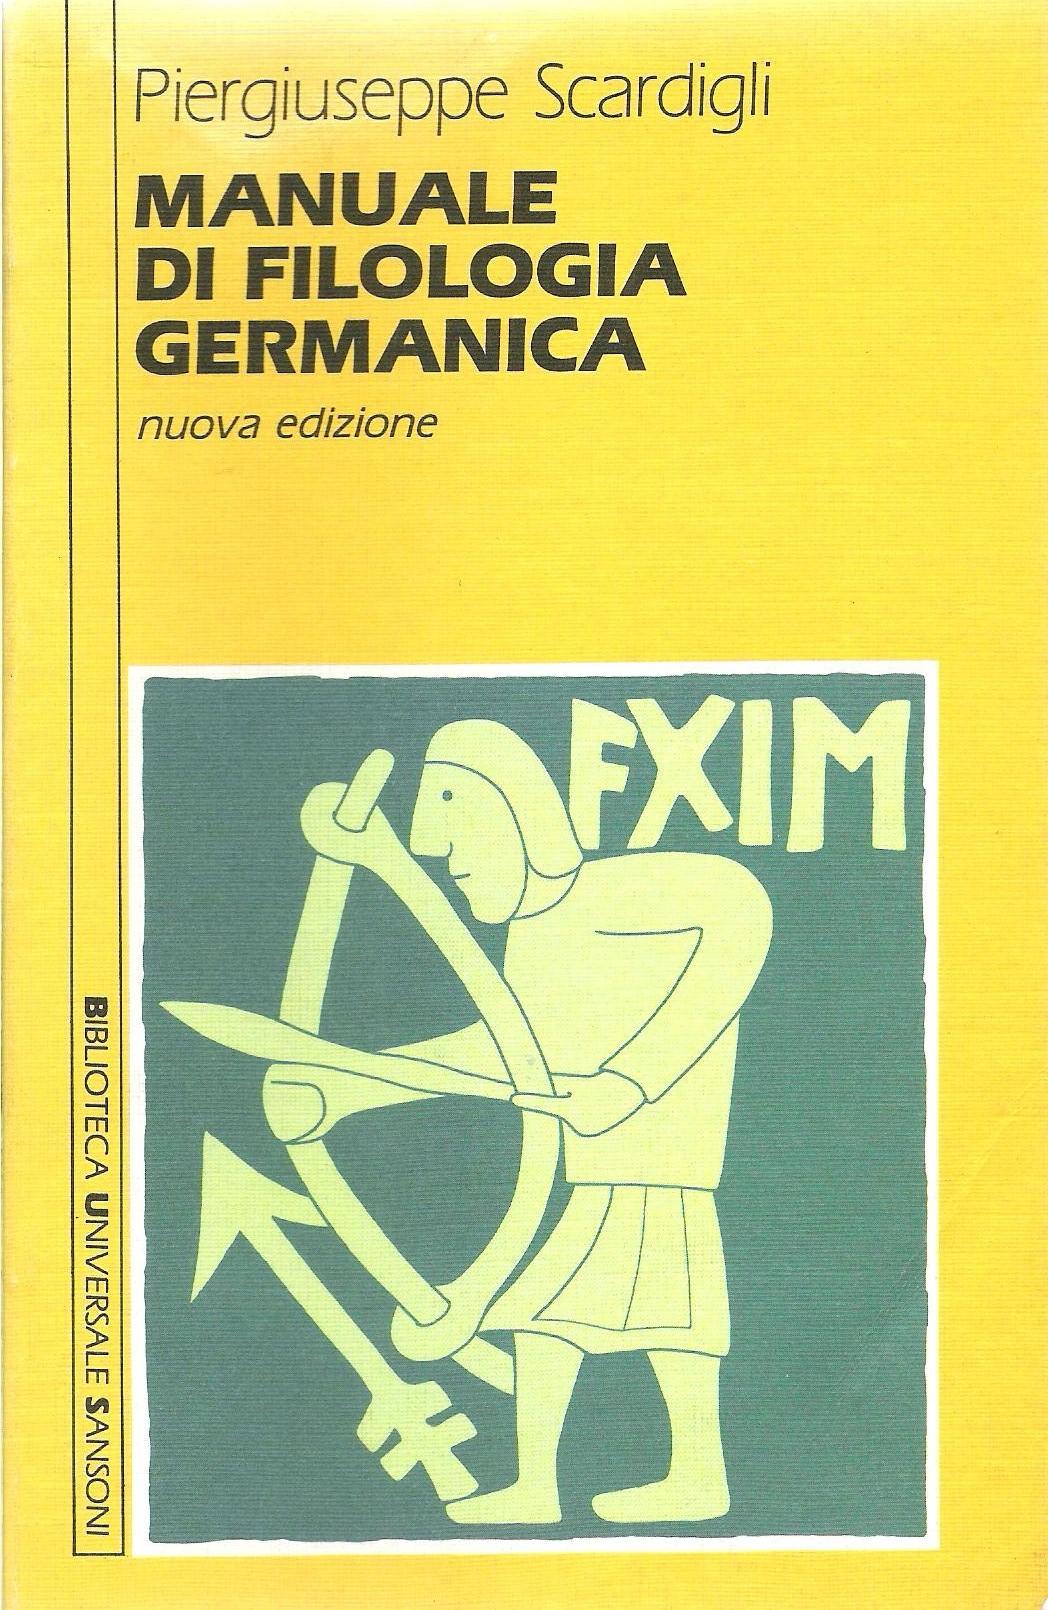 Manuale di filologia germanica